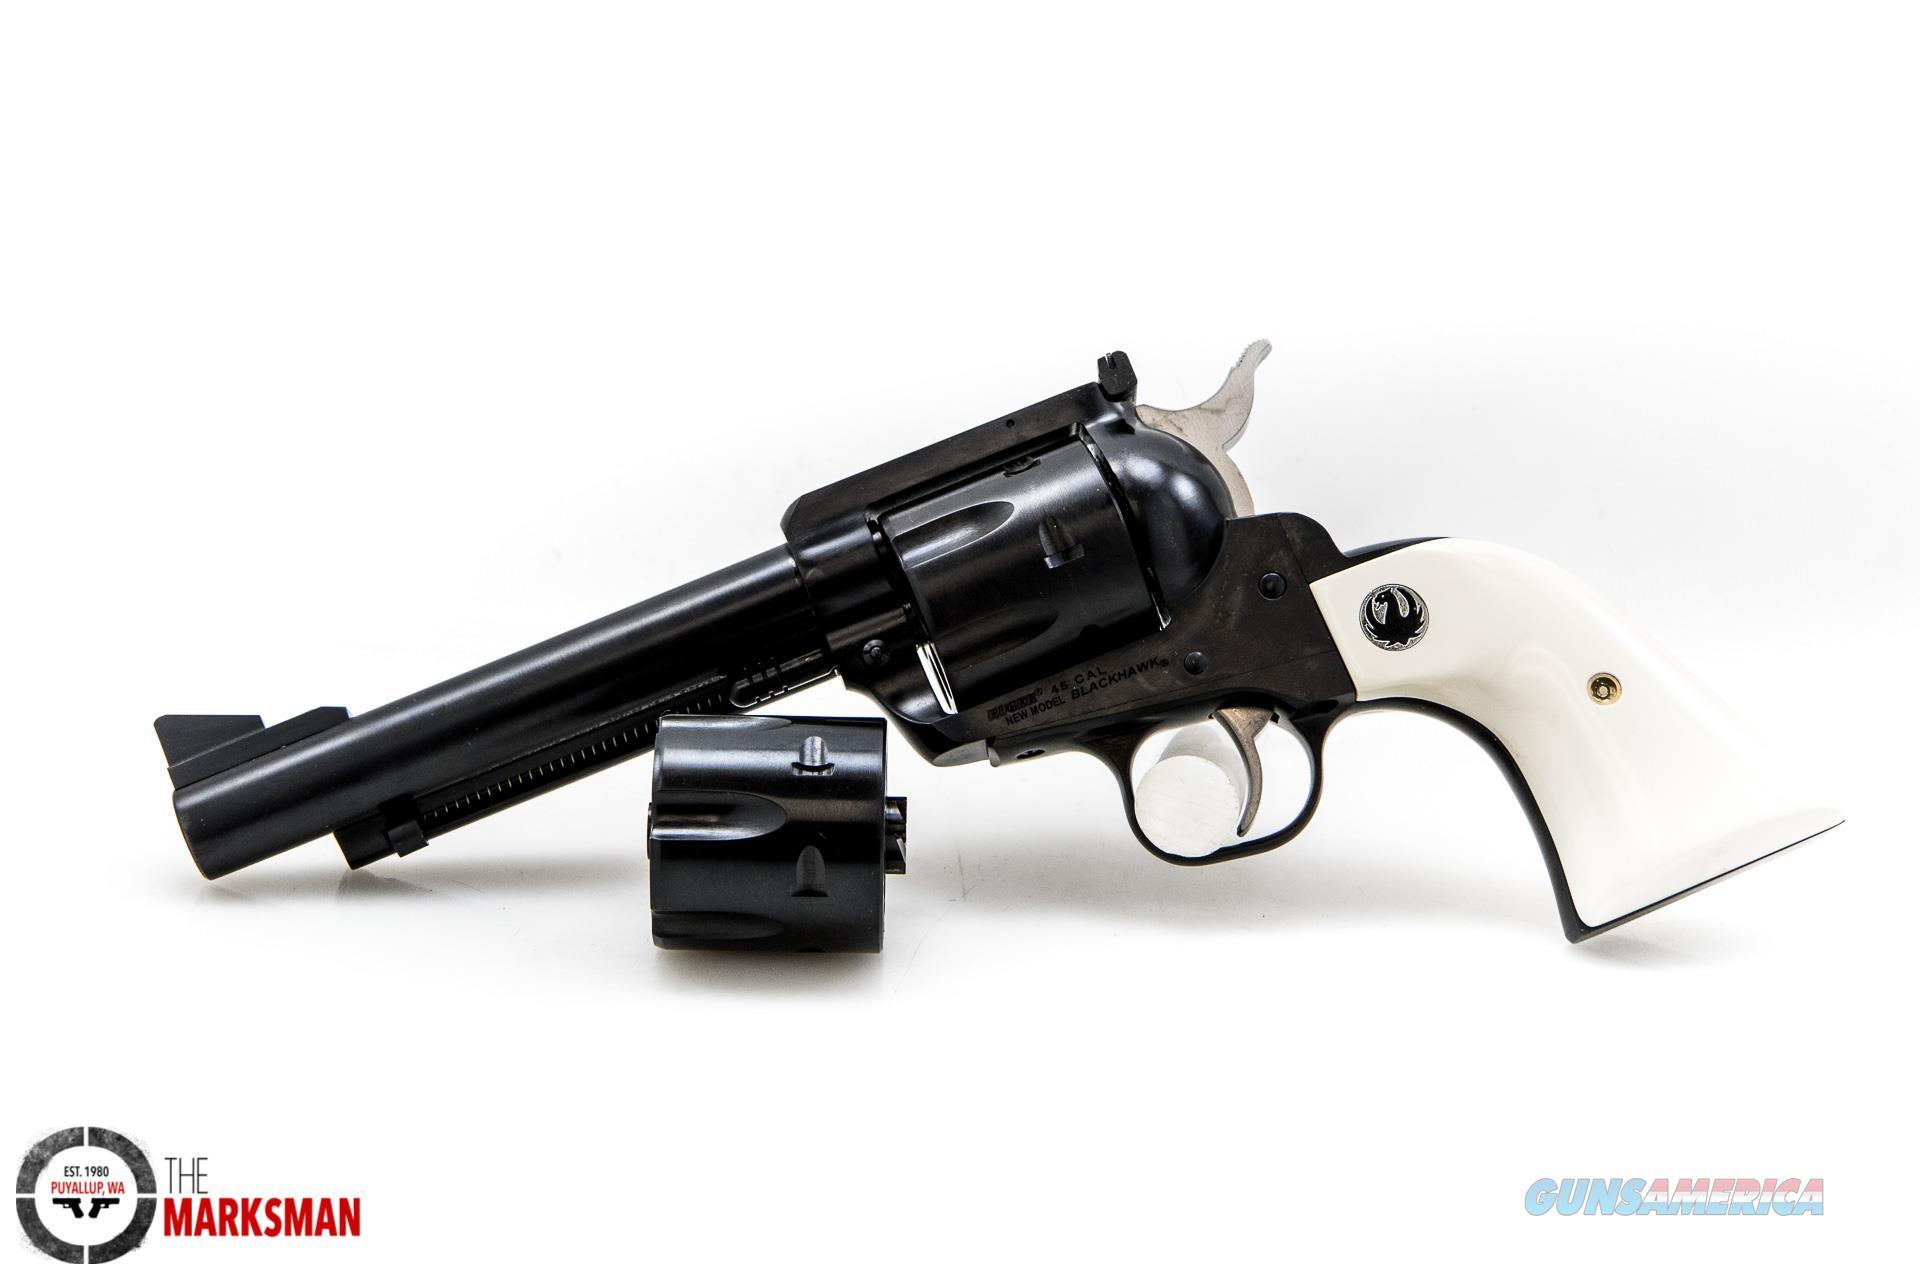 Ruger Convertible Blackhawk, .45 Colt/.45 ACP, Imitation Ivory Grips  Guns > Pistols > Ruger Single Action Revolvers > Blackhawk Type